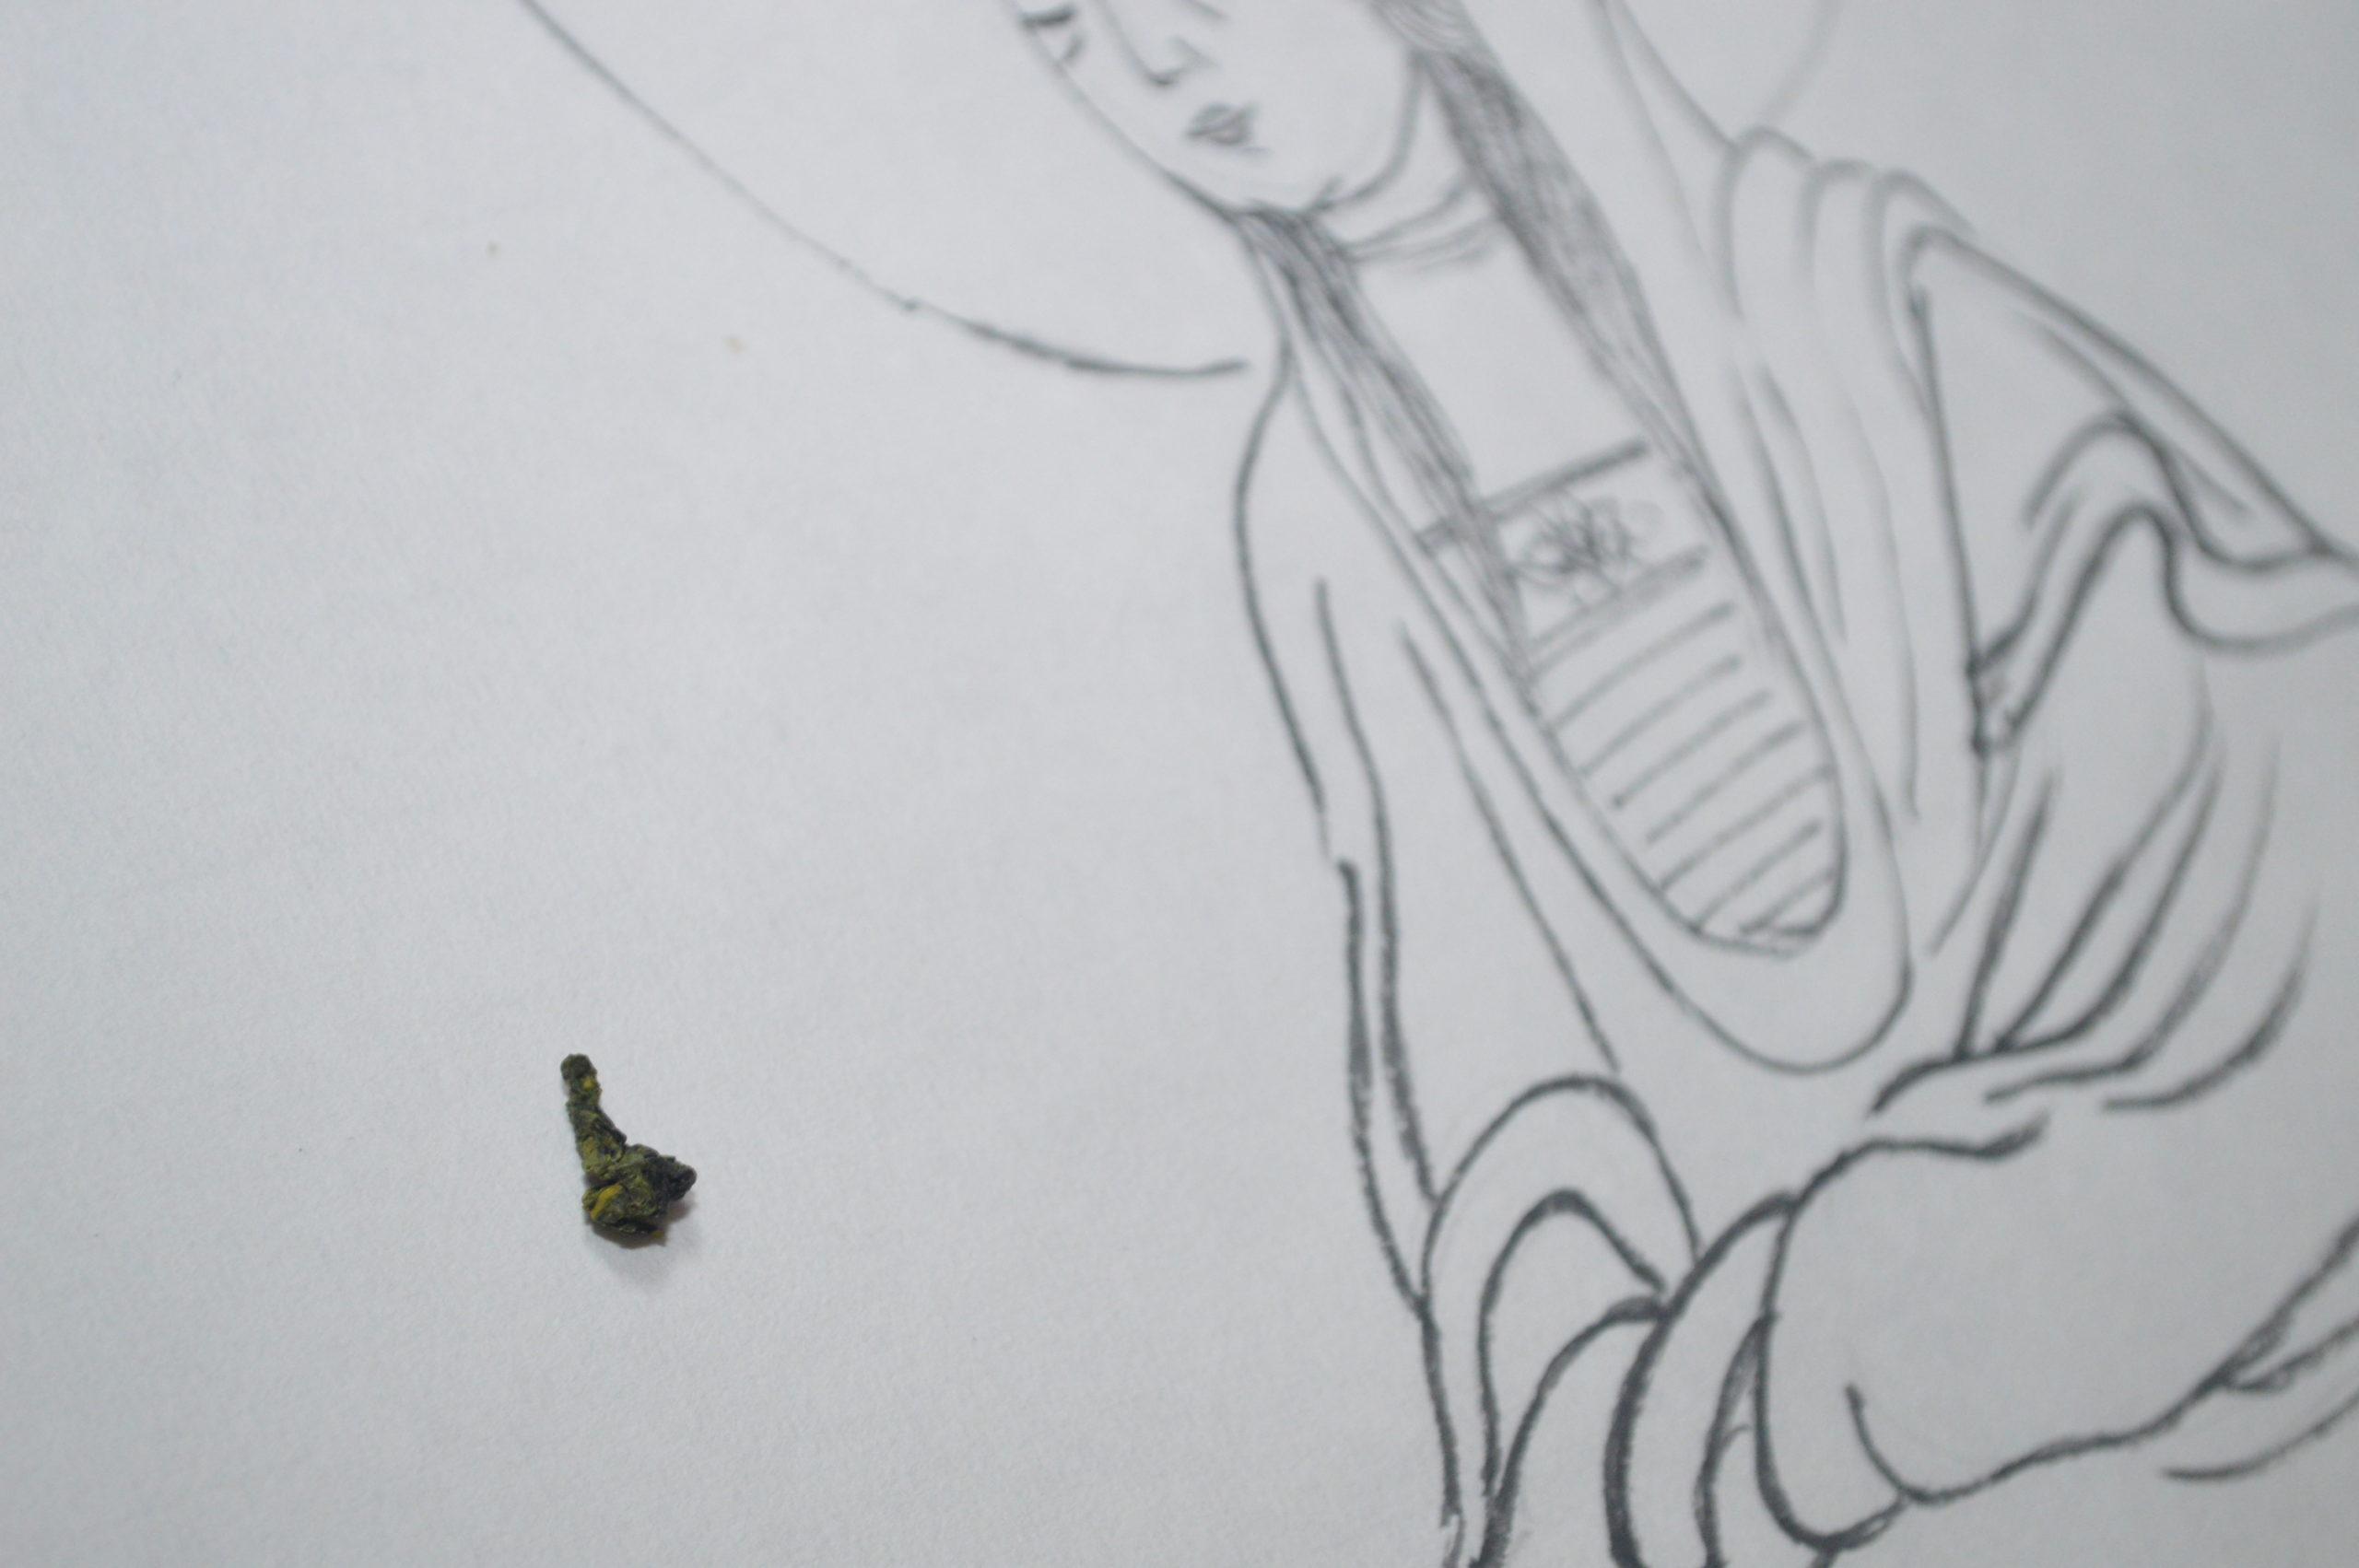 https://shop.liu-tea-art.com/wp-content/uploads/2020/06/DSC_0010-scaled.jpg